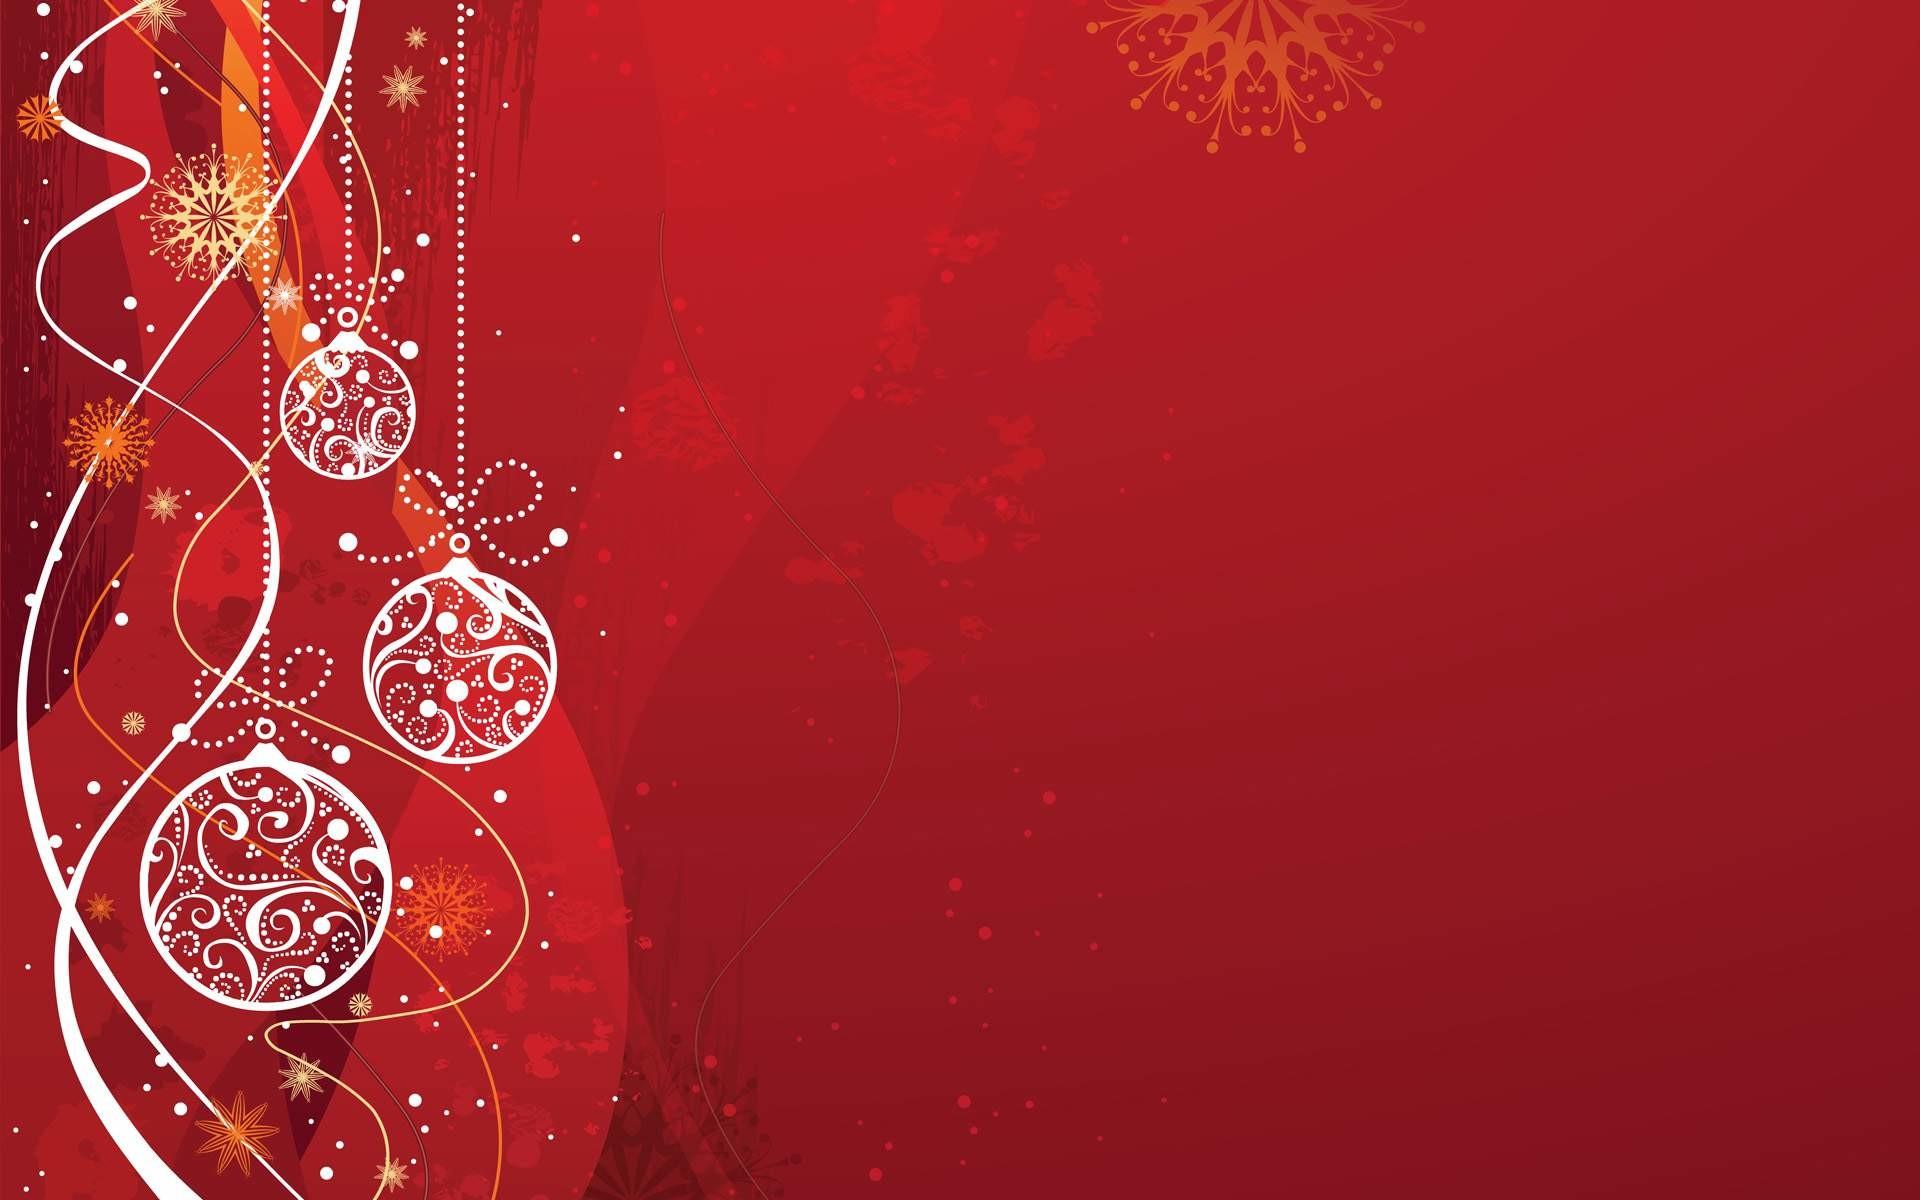 Xmas Stuff For > Christian Christmas Twitter Backgrounds